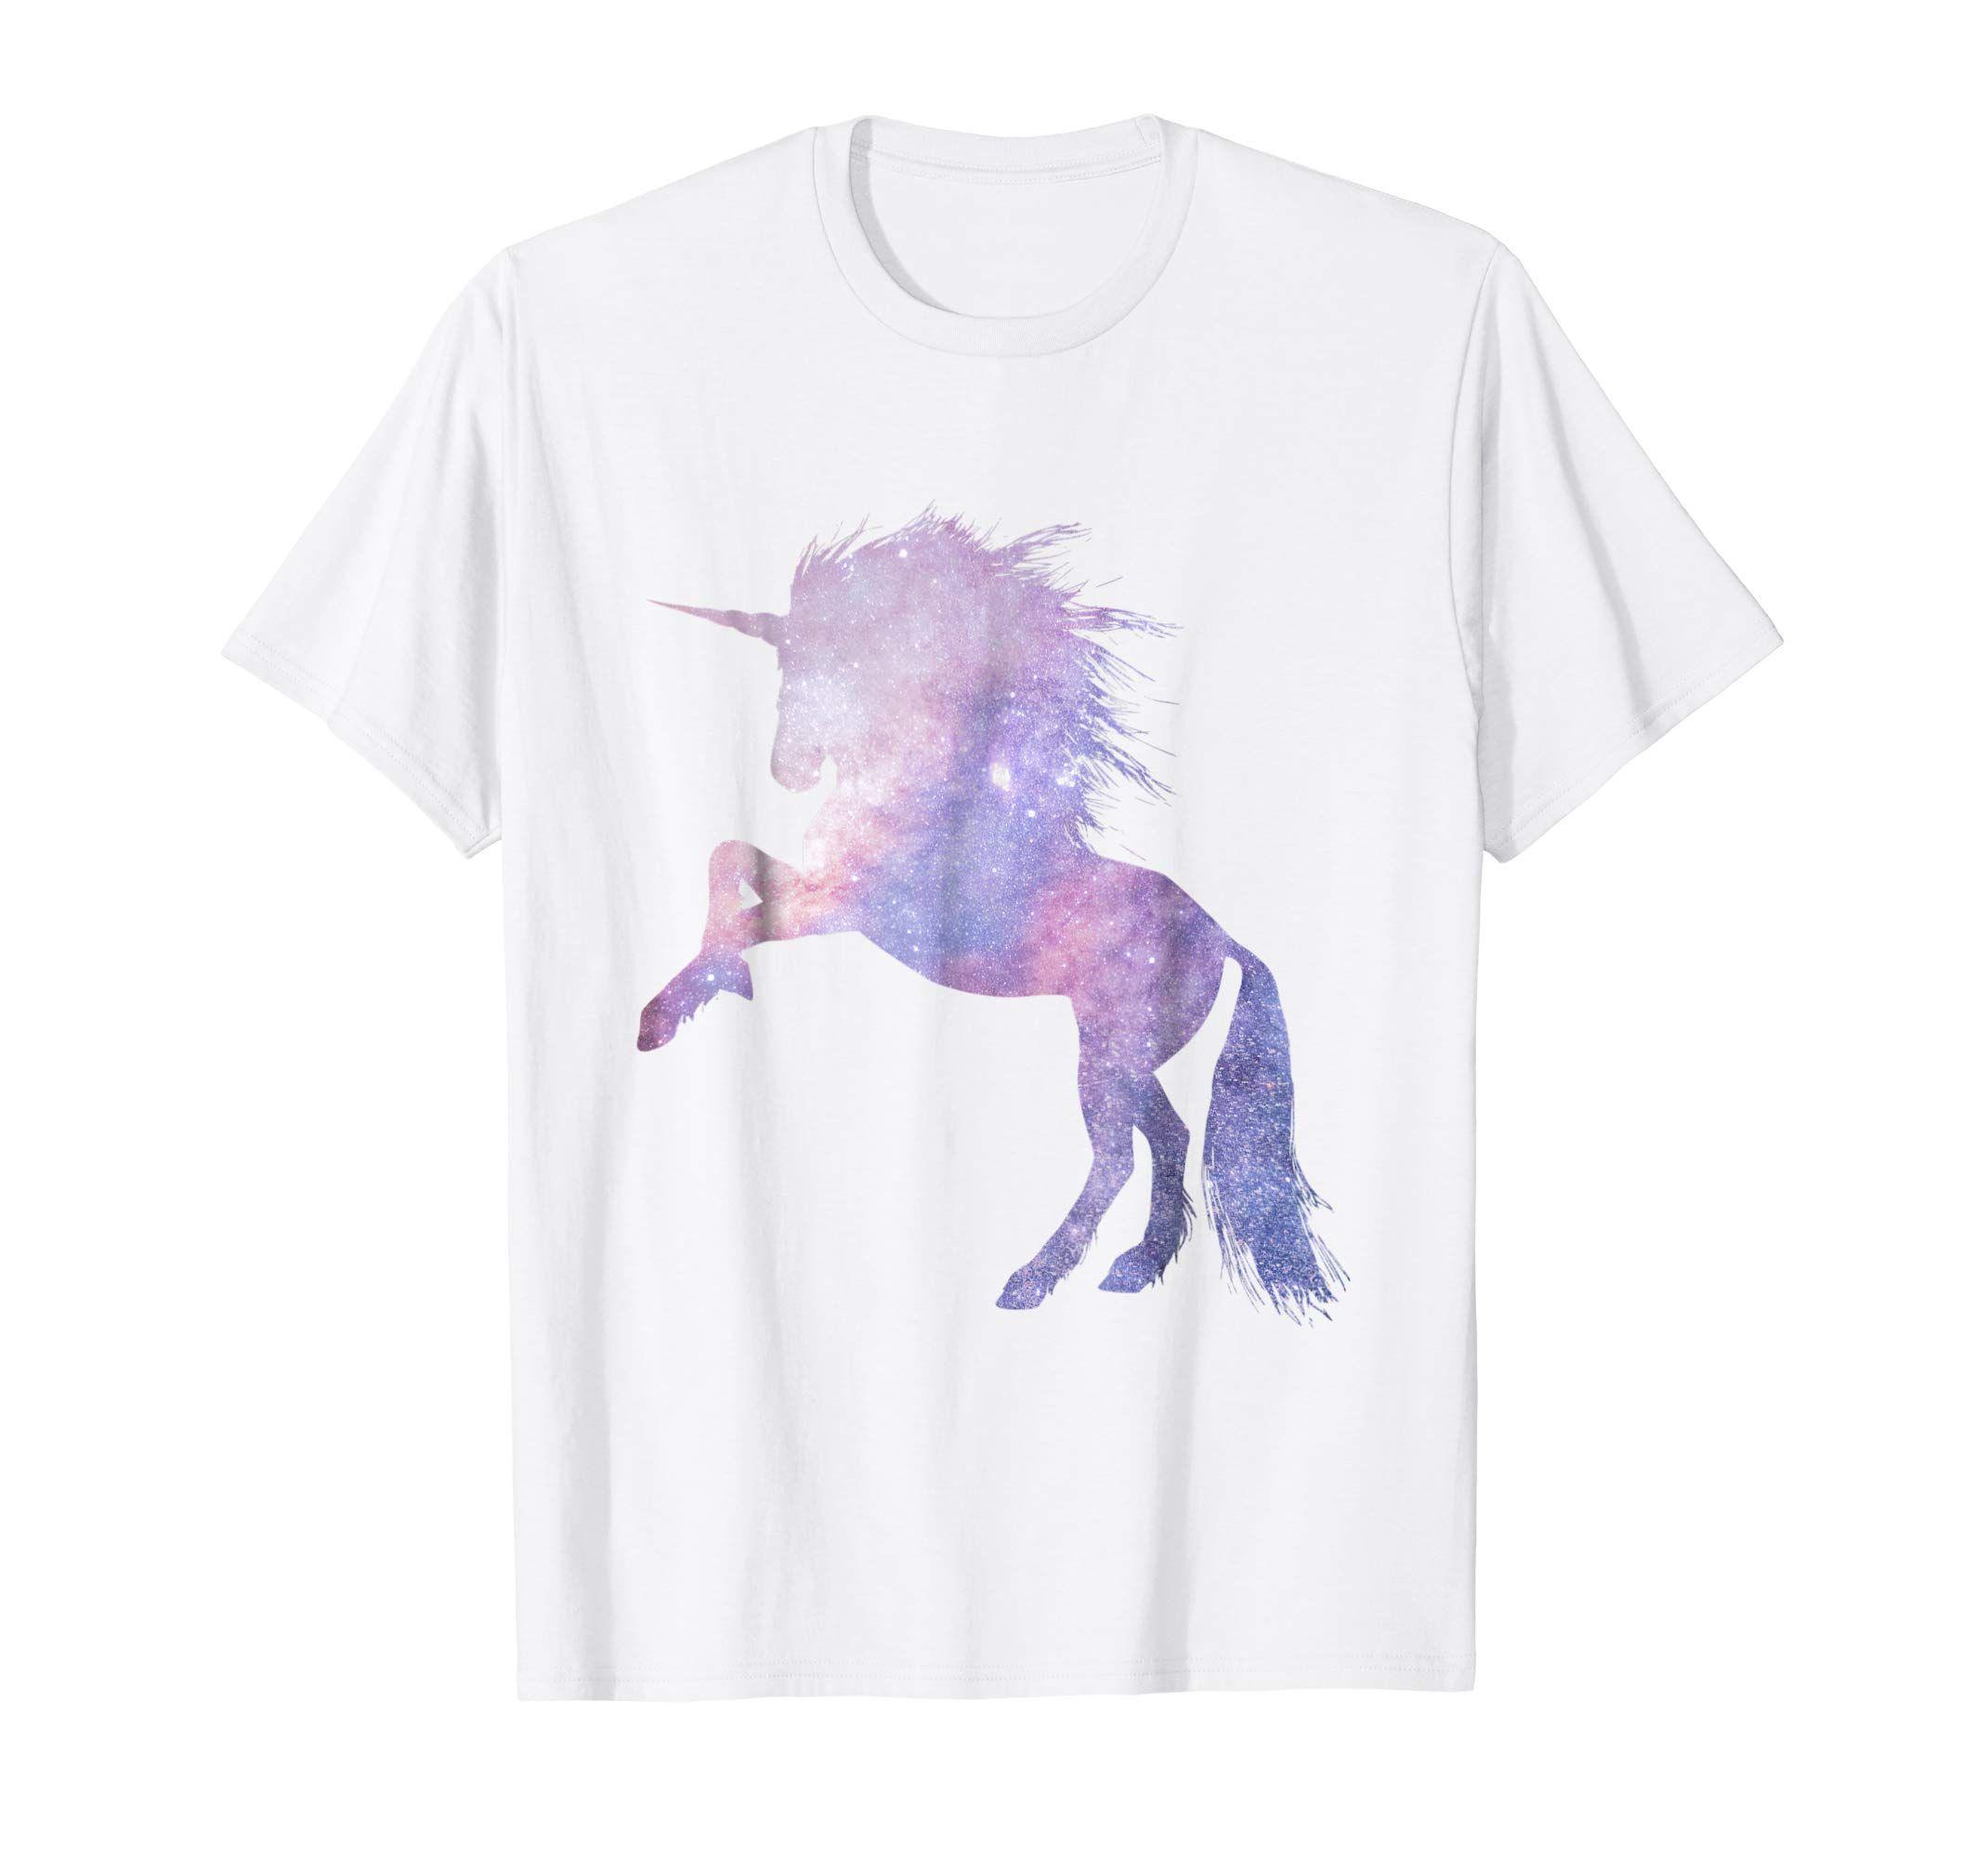 New Junior/'s Moon Unicorn T Shirt Women/'s Fantasy Magical Horse Pony Moonlight